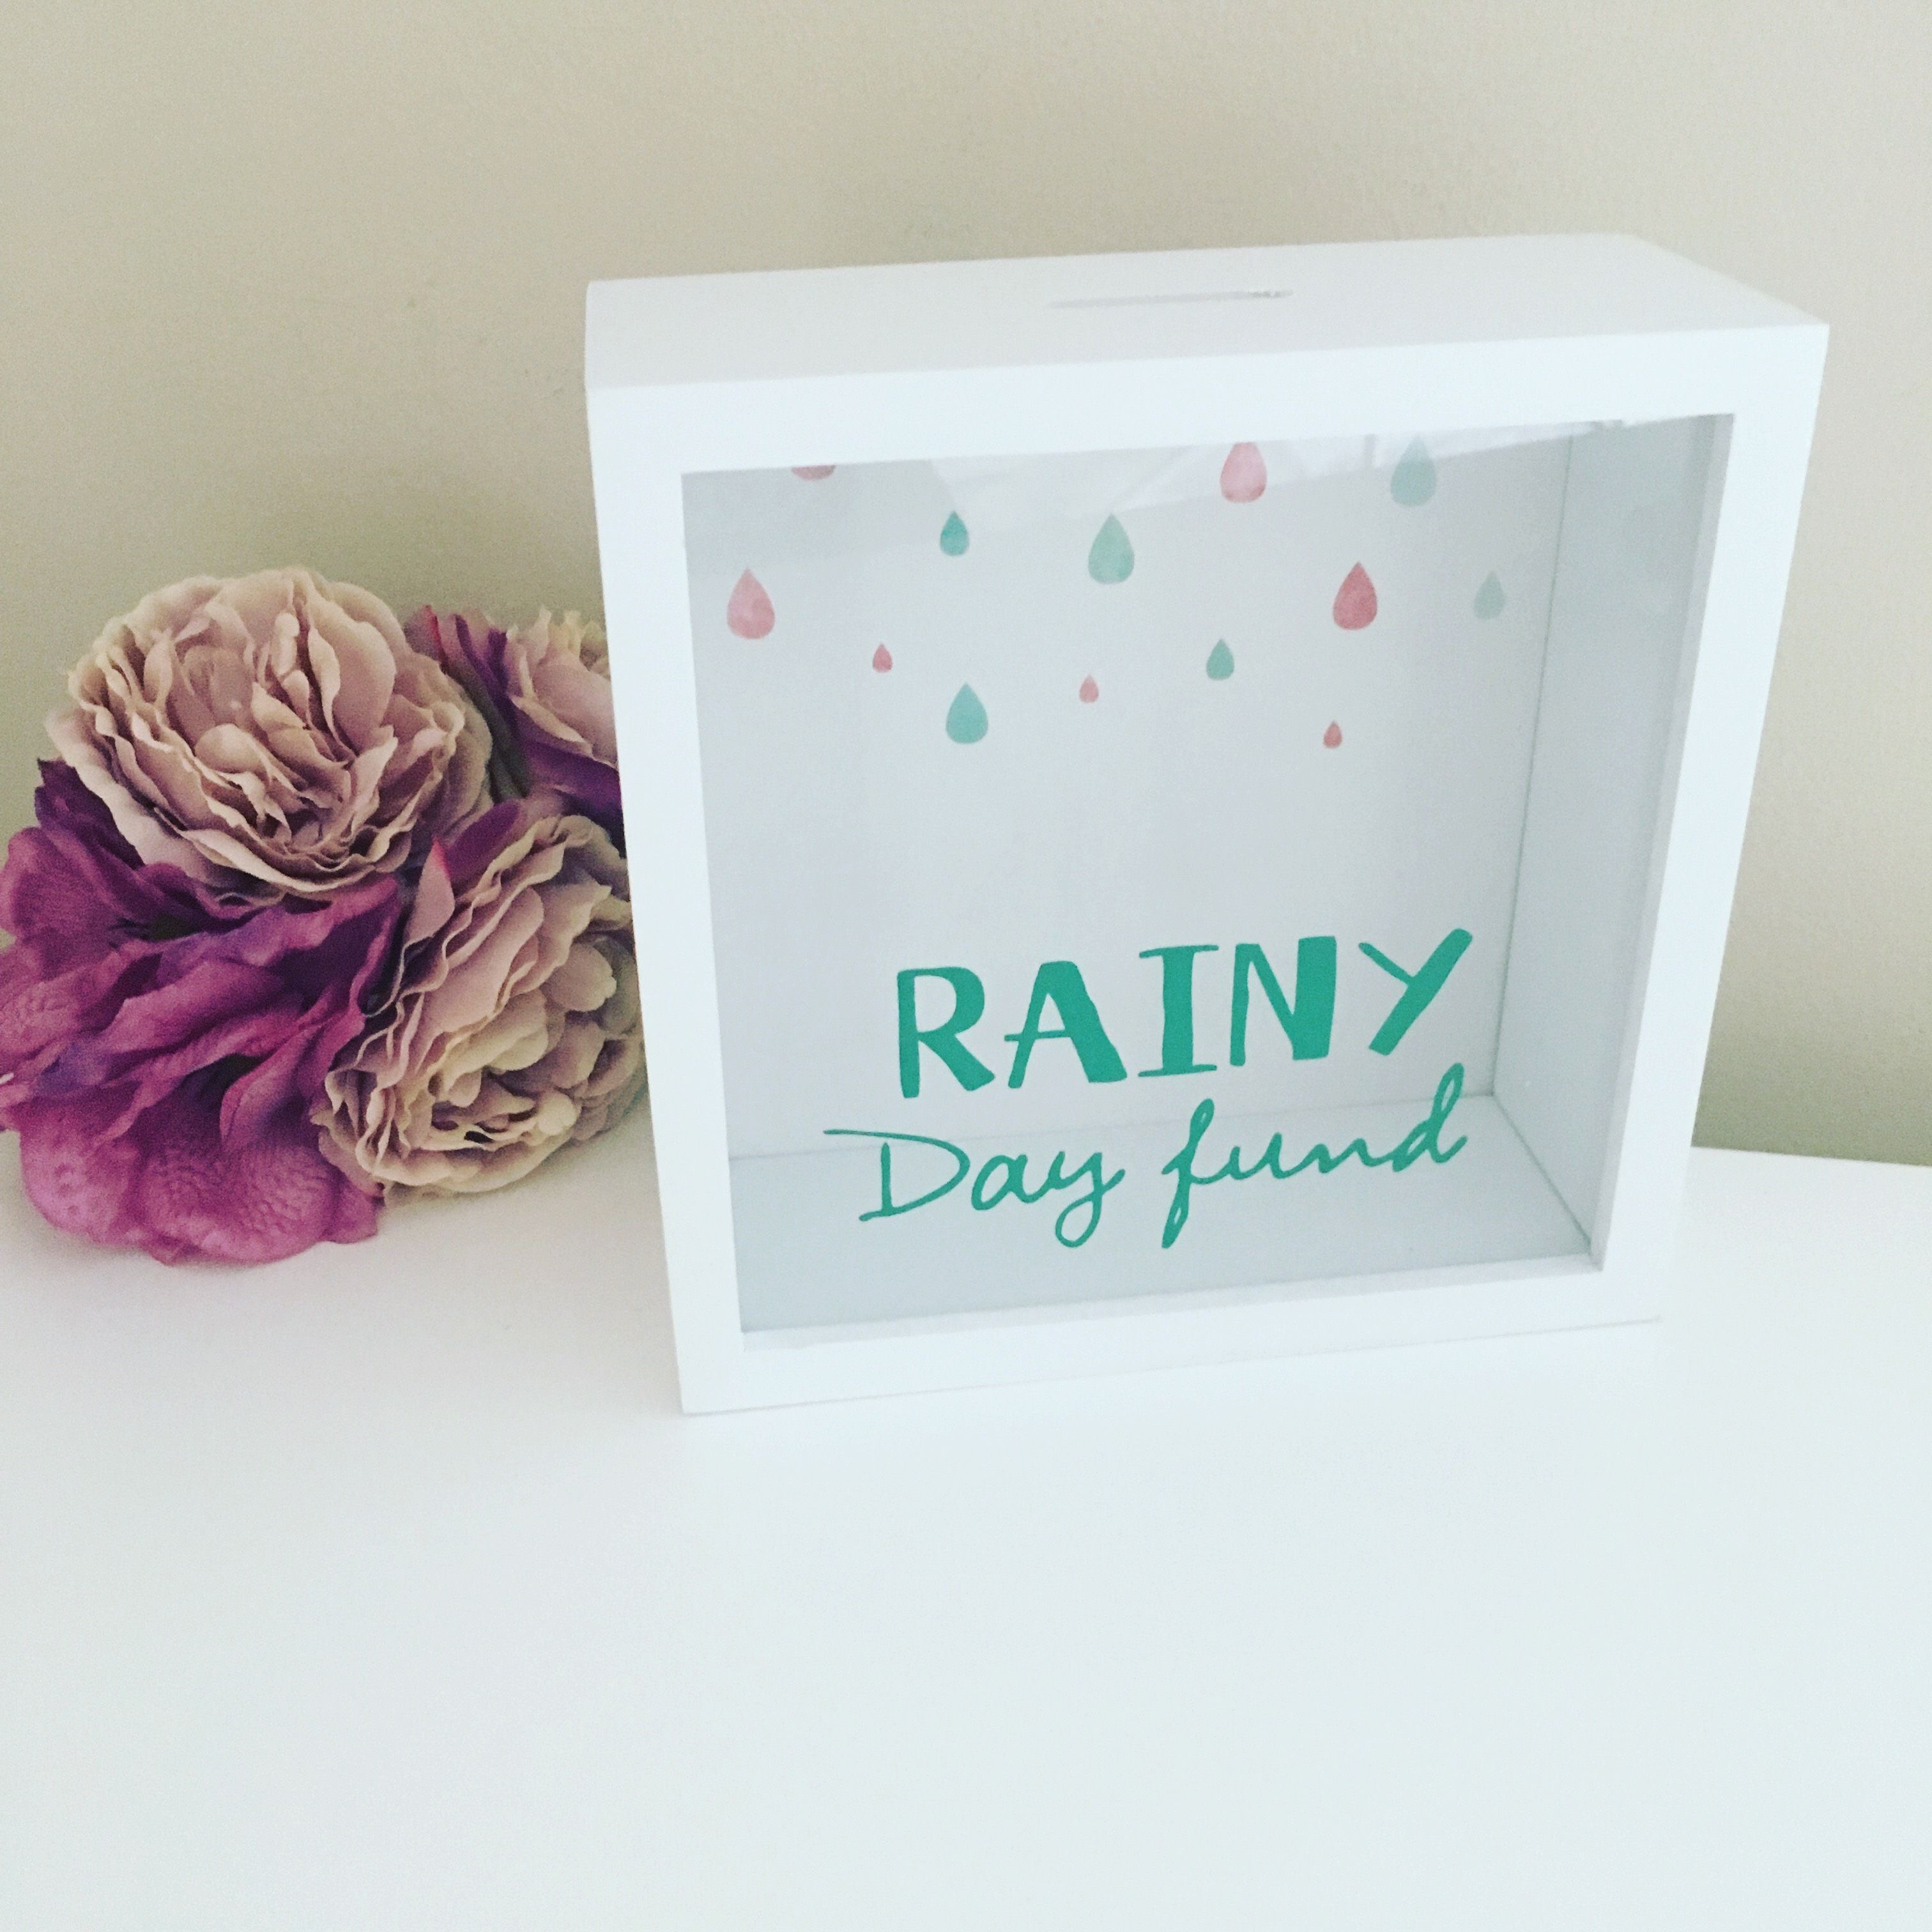 Rainy Day fund Money Box   Cool shit   Pinterest   Money box, Box ...